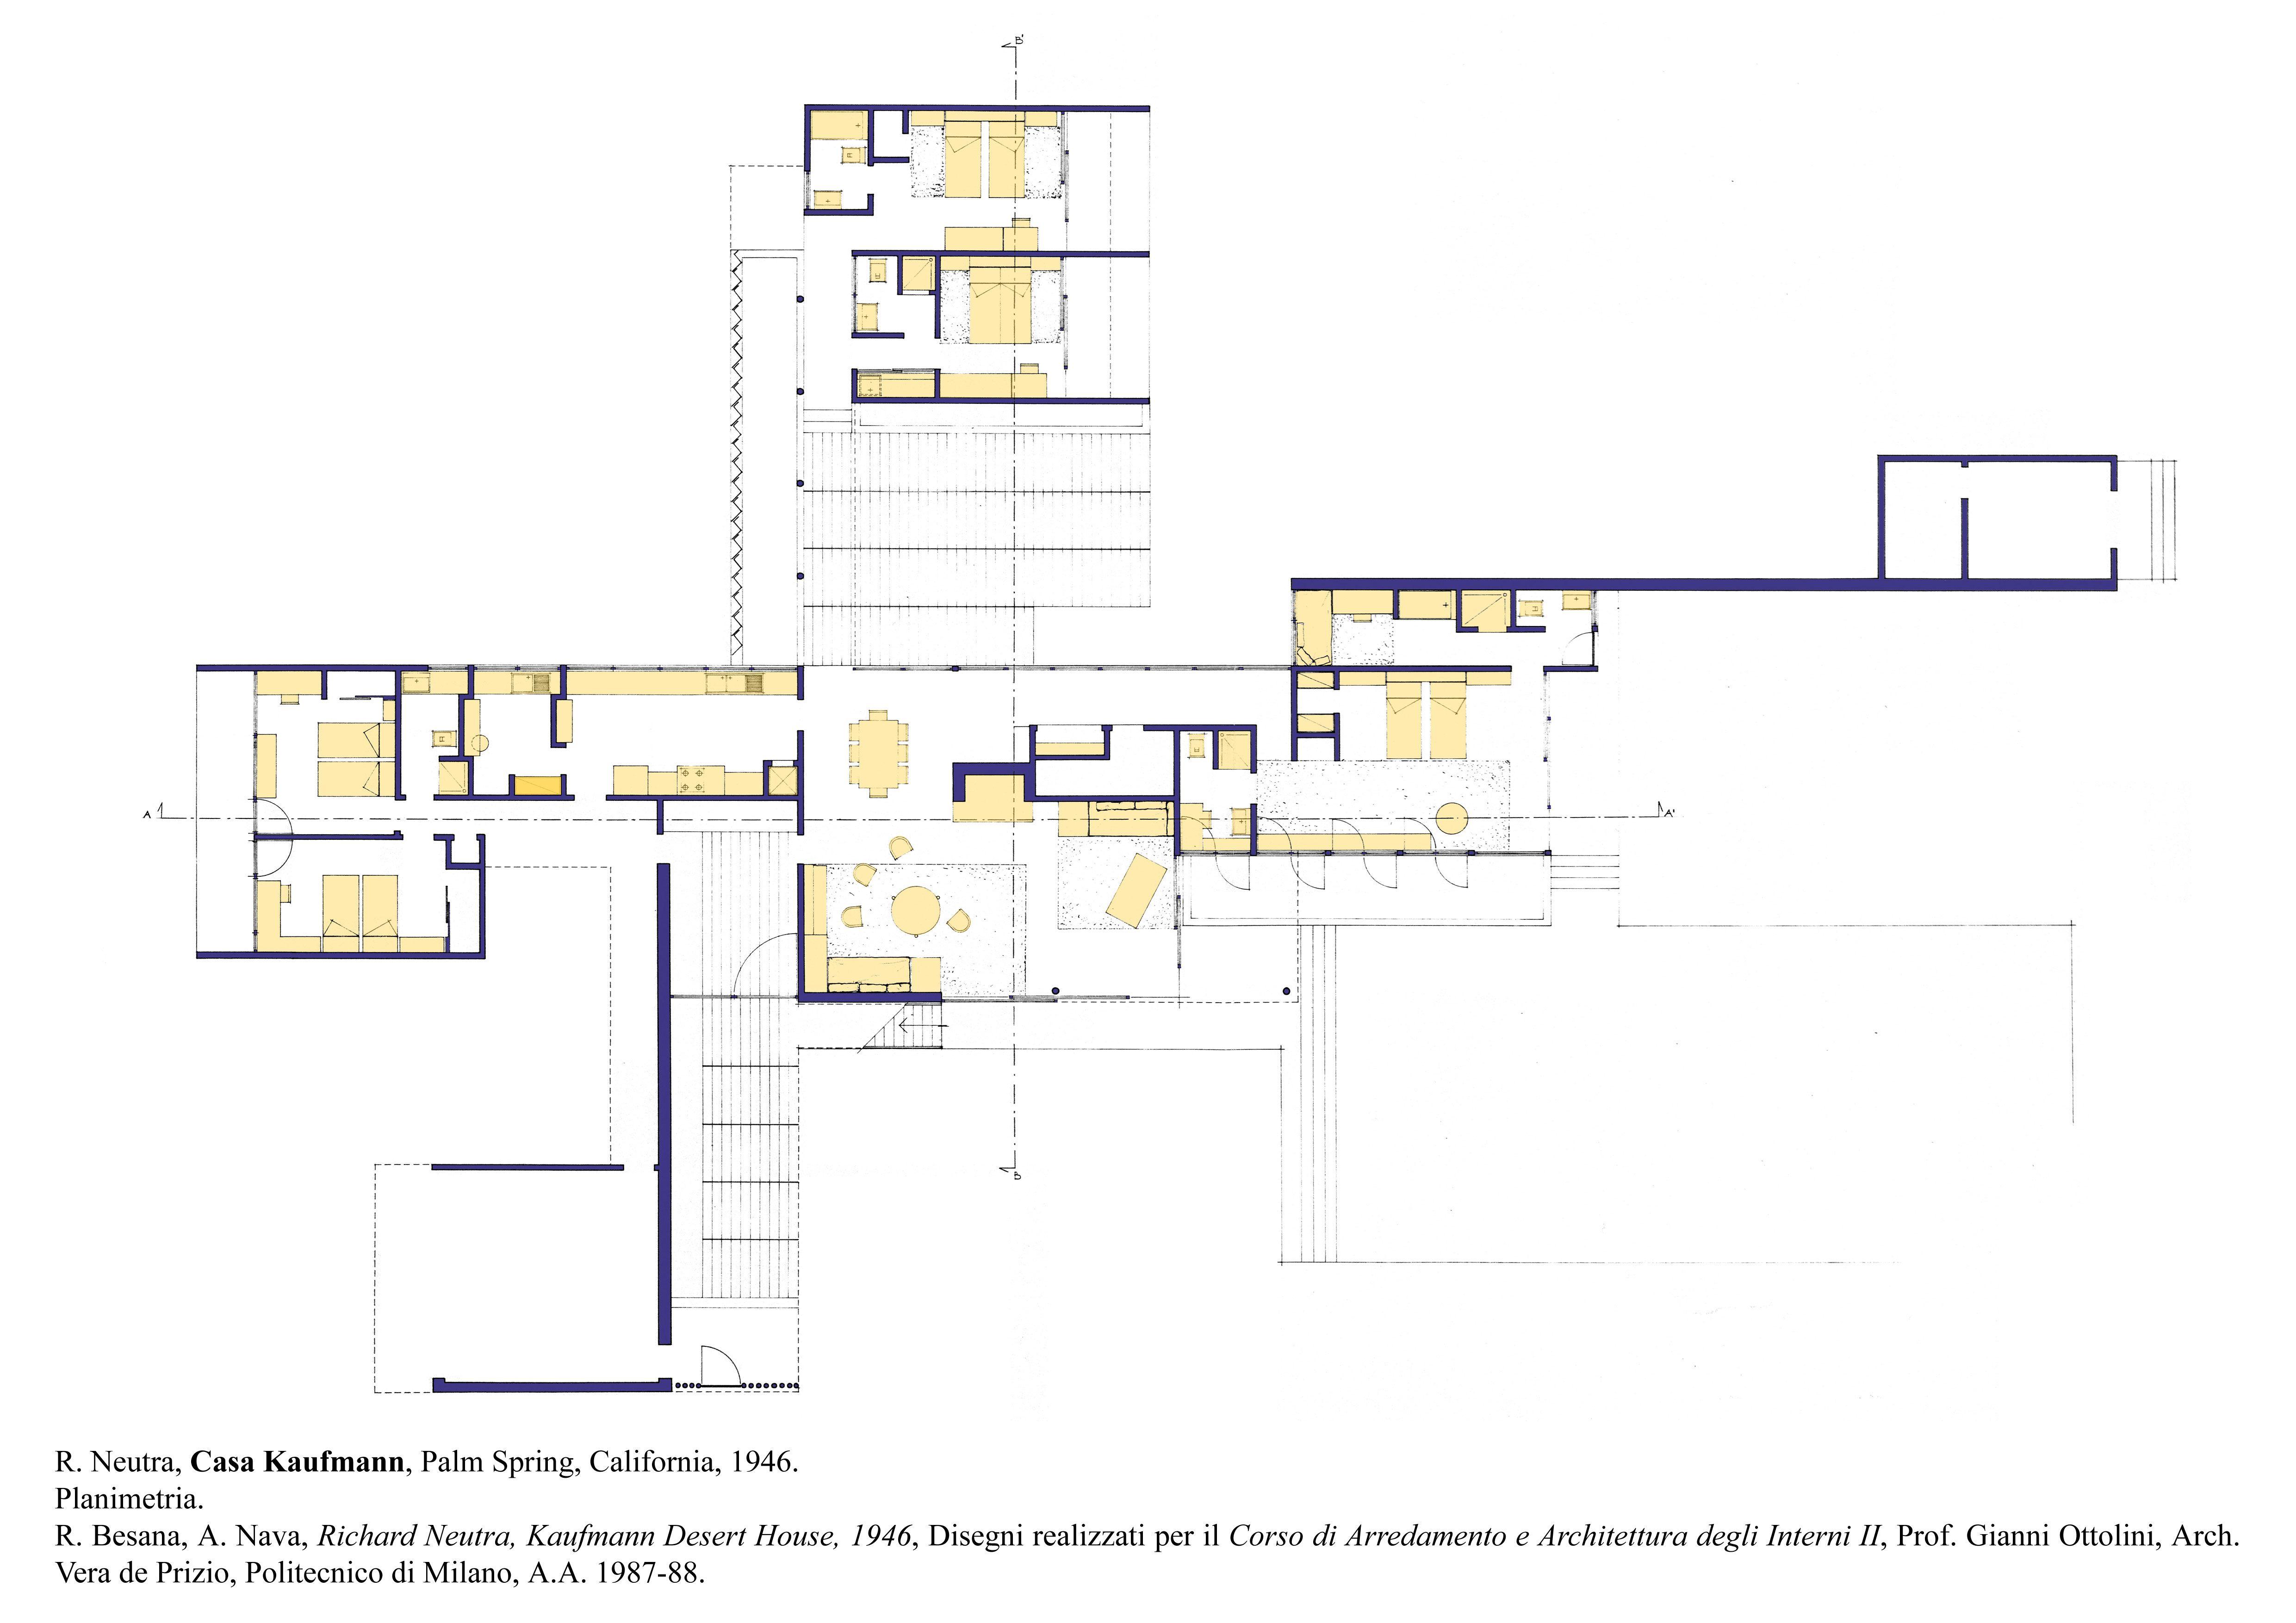 coloring a plan layout a mp plans pinterest layouts richard